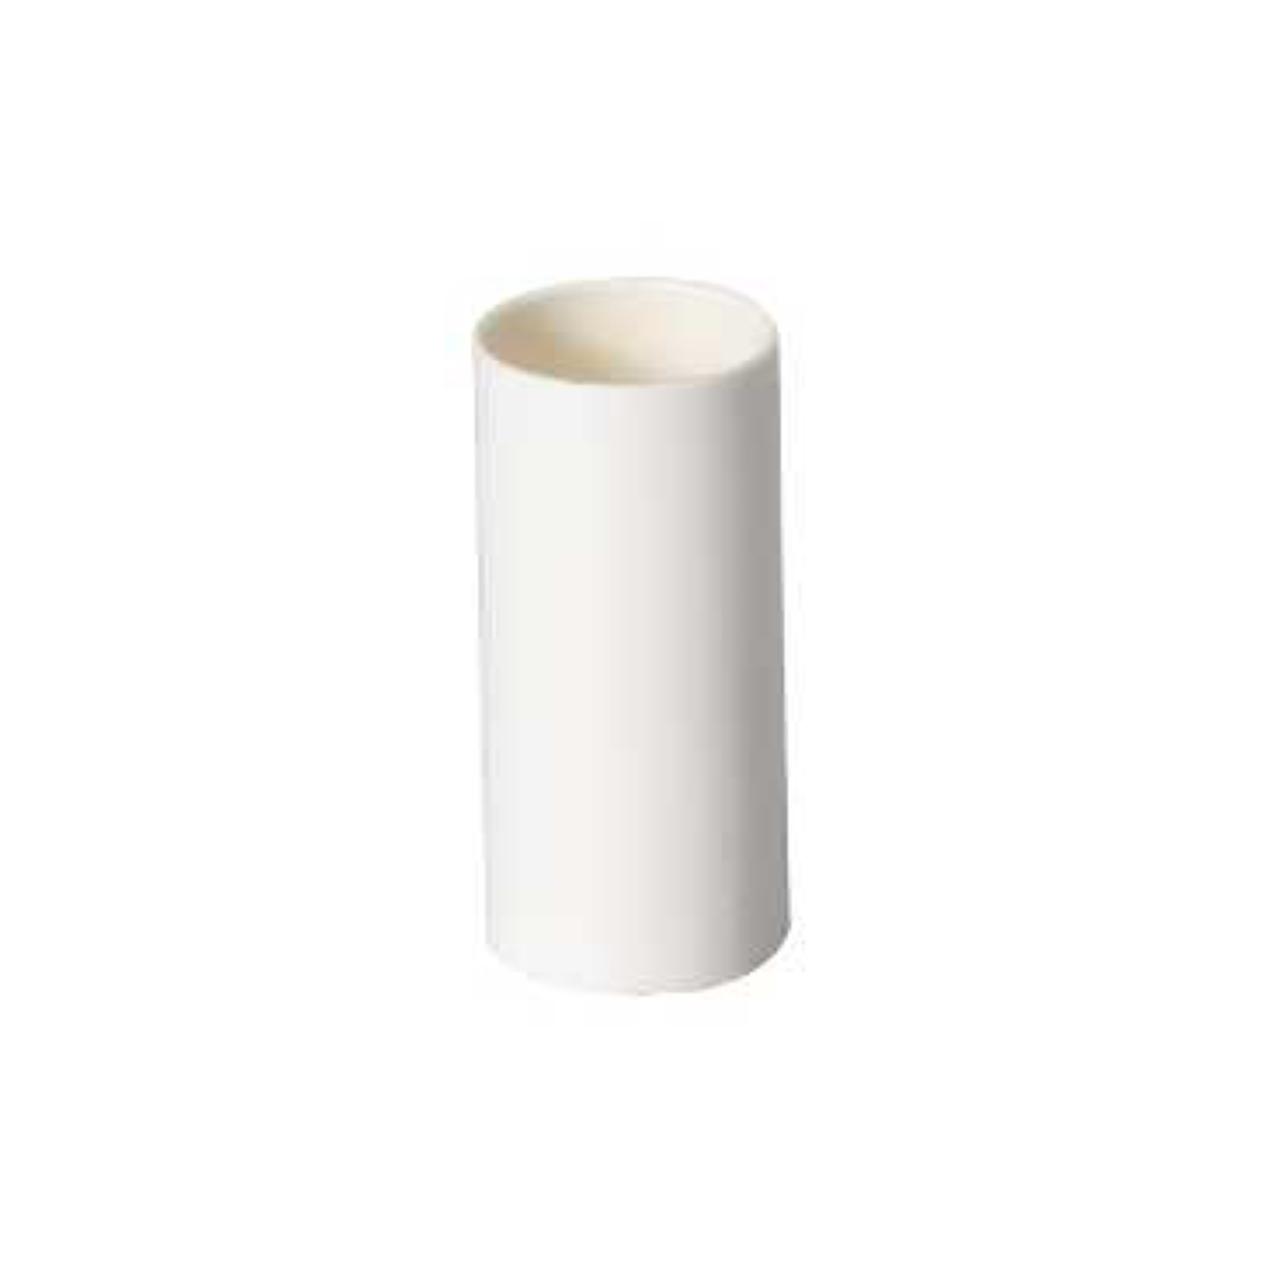 manchon pour tube irl 3321 diam tre 20 mm blanc schnei. Black Bedroom Furniture Sets. Home Design Ideas